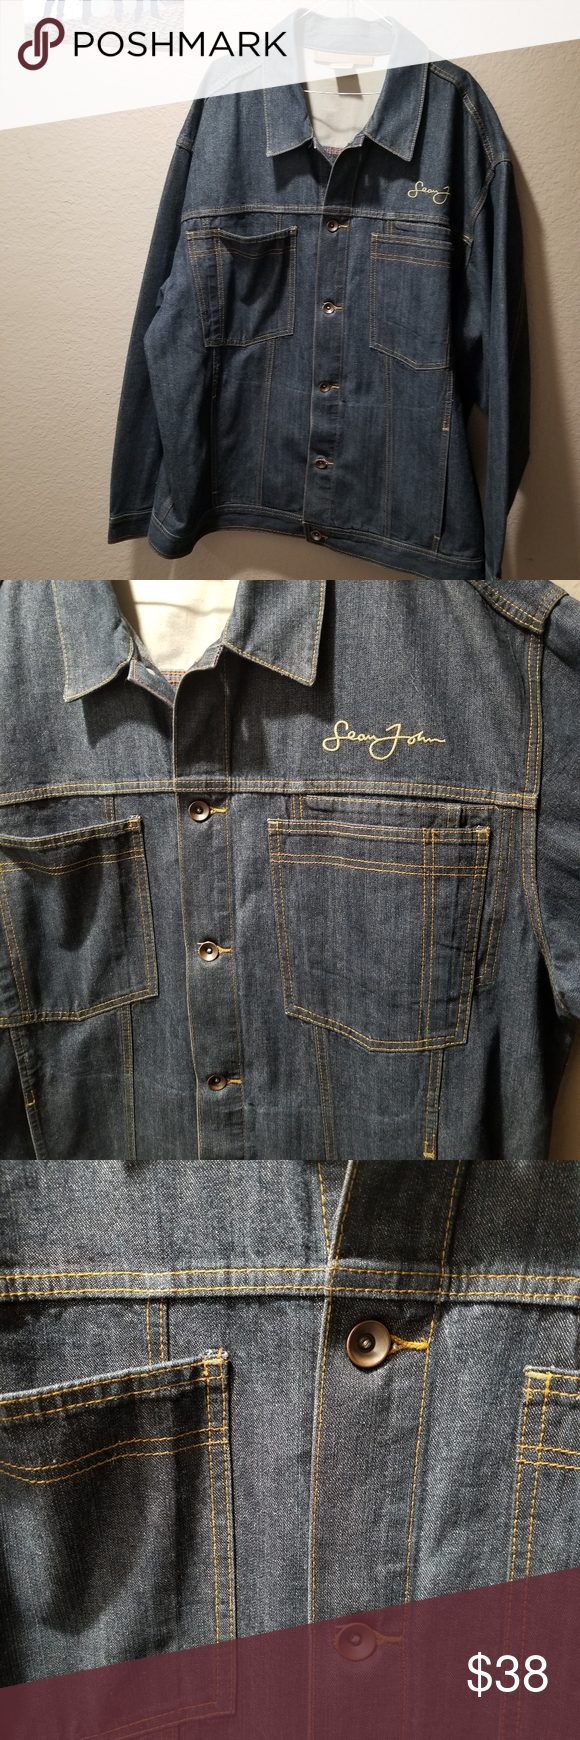 Sean John Ldenim Blue Jean Jacket Sean John 100 Cotton Denim Blue Jean Jacket Men S Xxxl Like New Grea Blue Jean Jacket Mens Jean Jacket Men Blue Jean Jacket [ 1740 x 580 Pixel ]